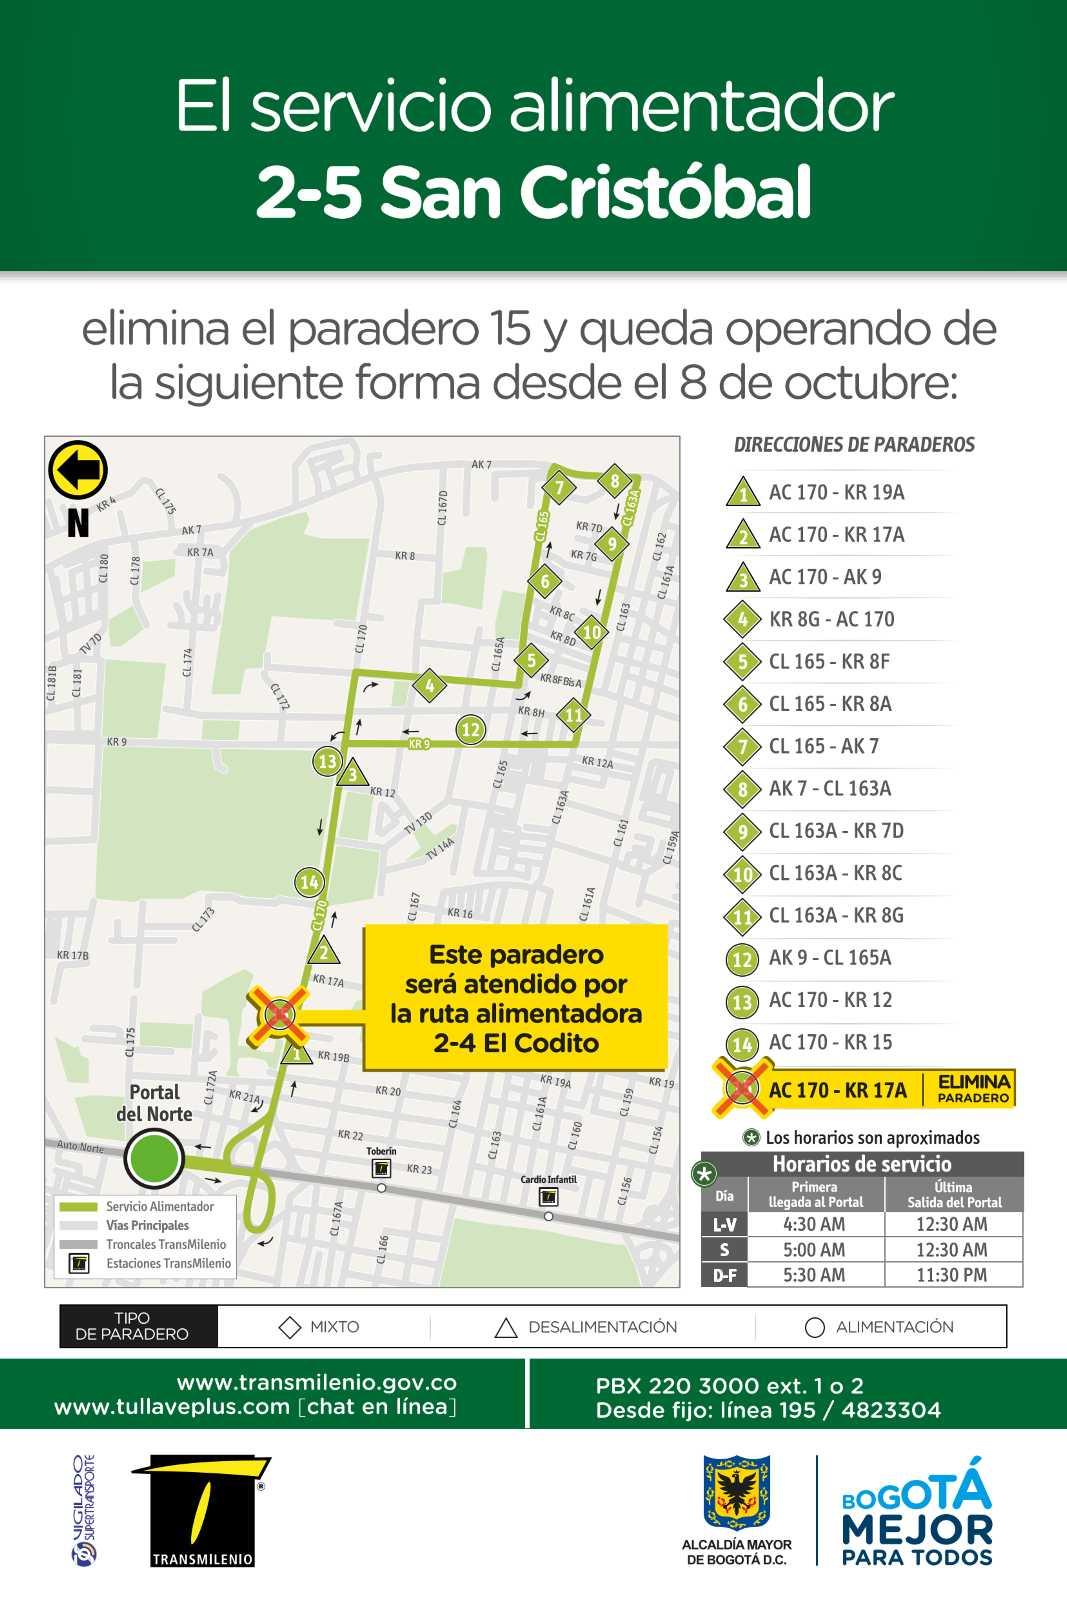 2-5 San Cristóbal (mapa y paradas)